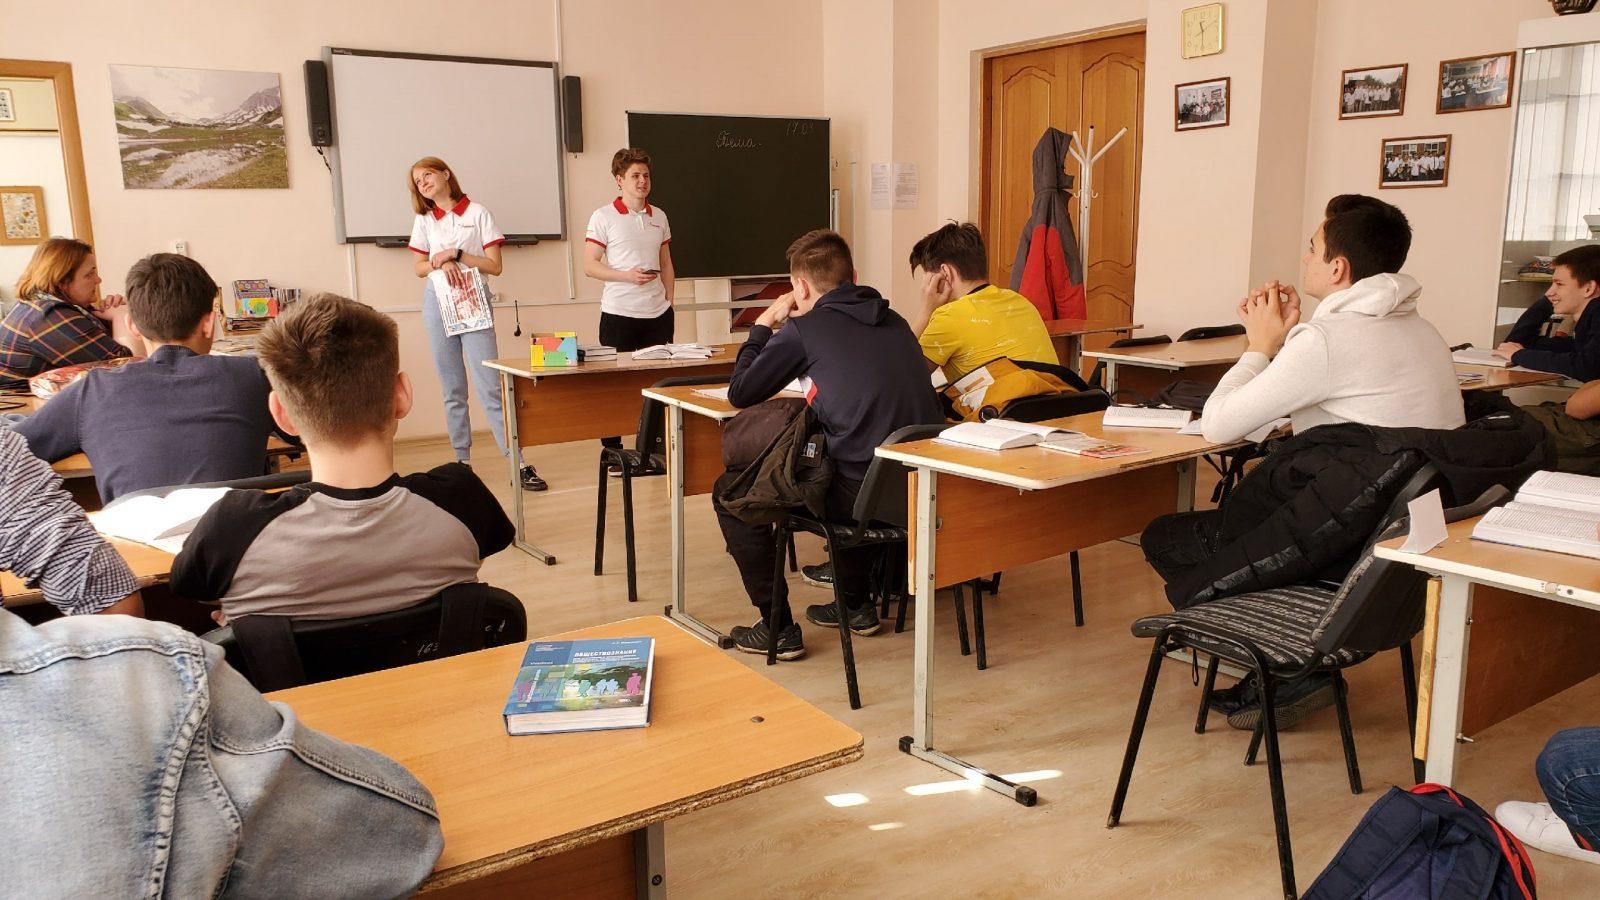 ДЦ «Волонтер» | Апшеронский район.  17.03.2020  Лекции о коронавирусной